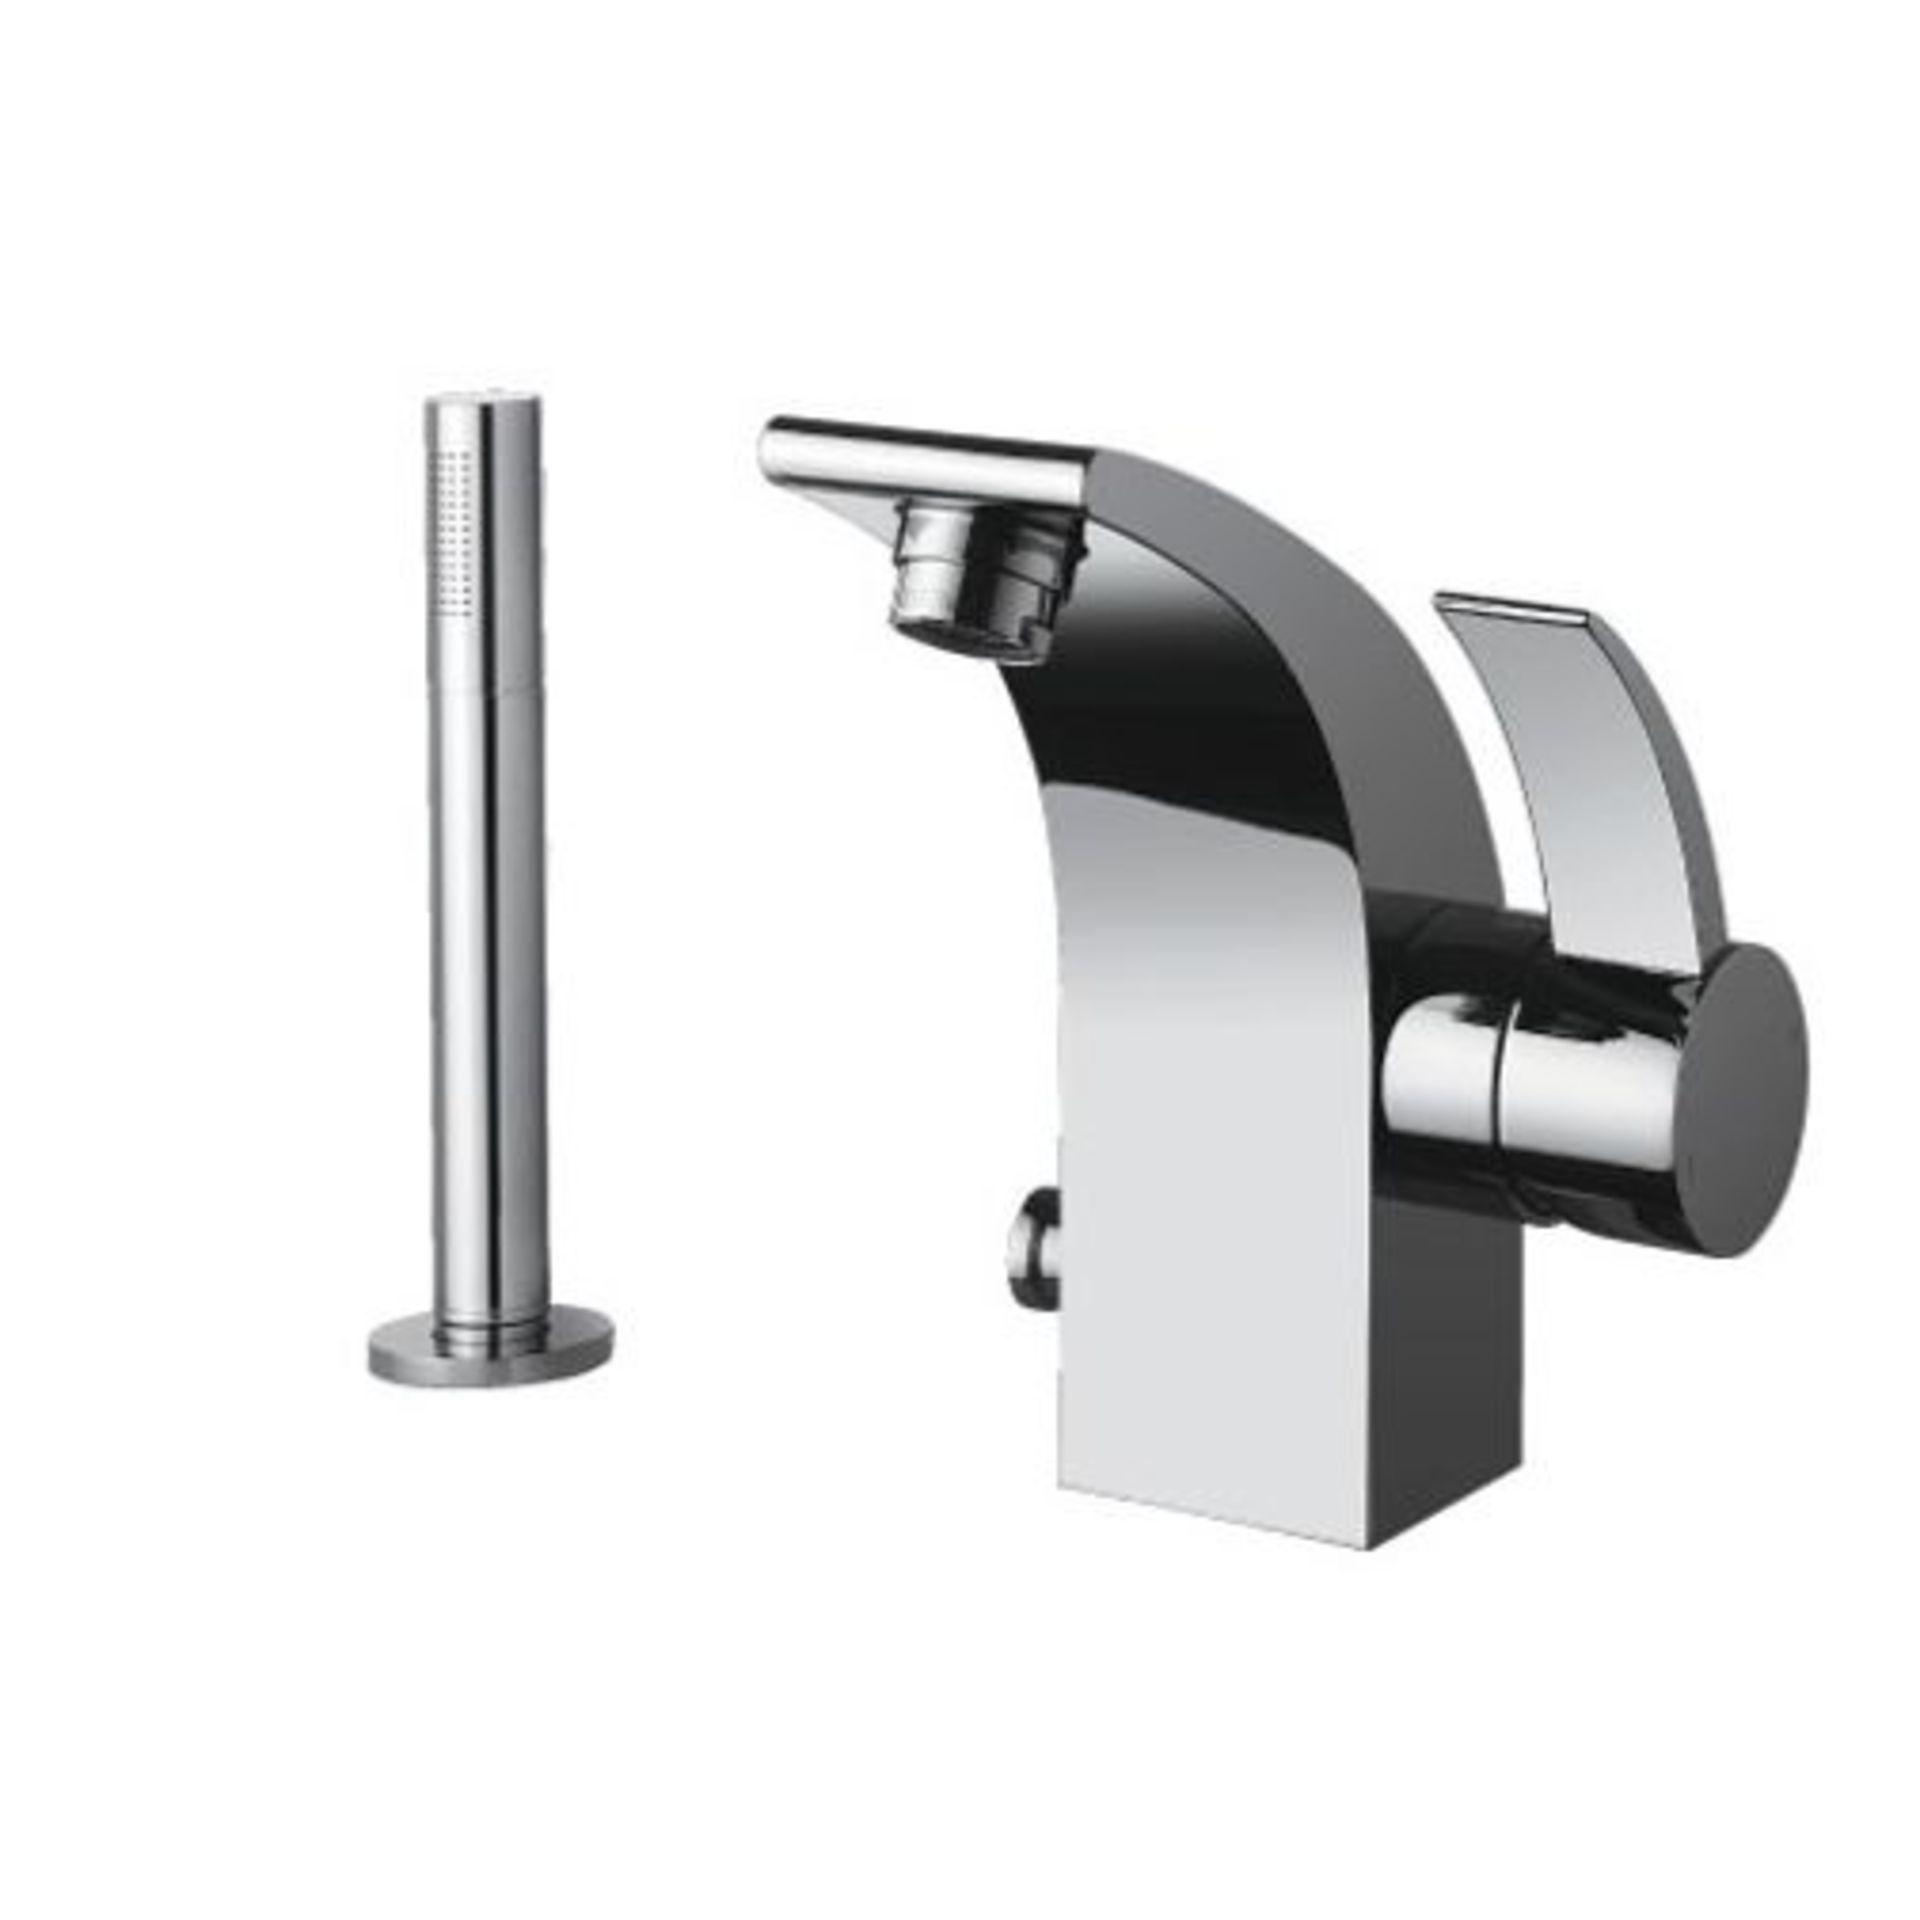 Lot 8 - Bathstore 'Sublime' very high quality, designer bath & shower mono mixer tap.